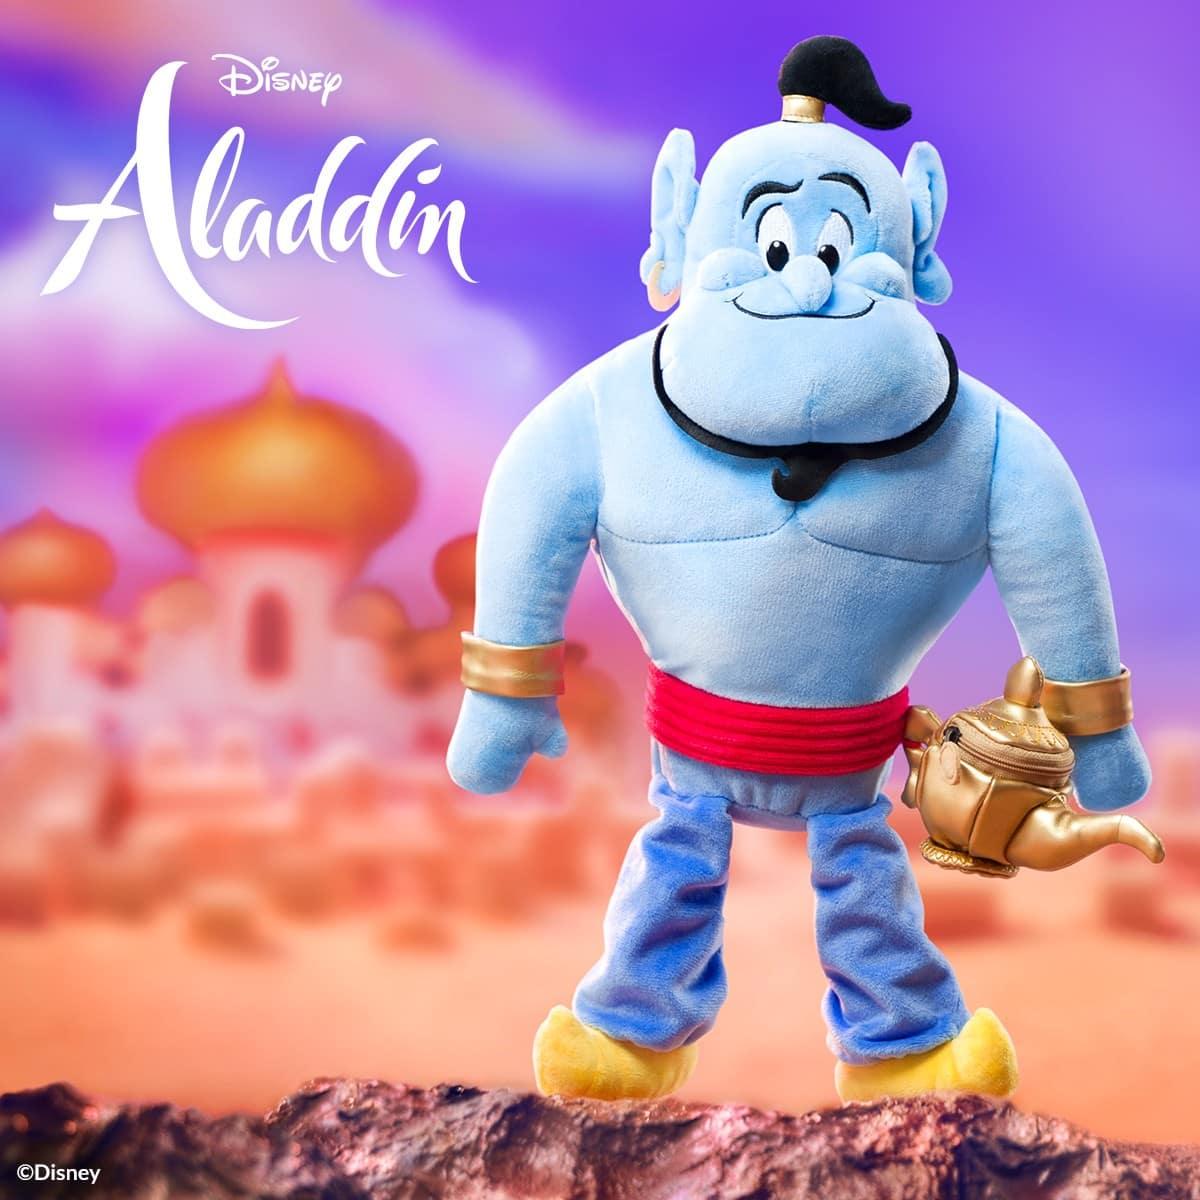 Disney's Aladdin Scentsy Collection |  Genie Scentsy Buddy | Shop 7/26